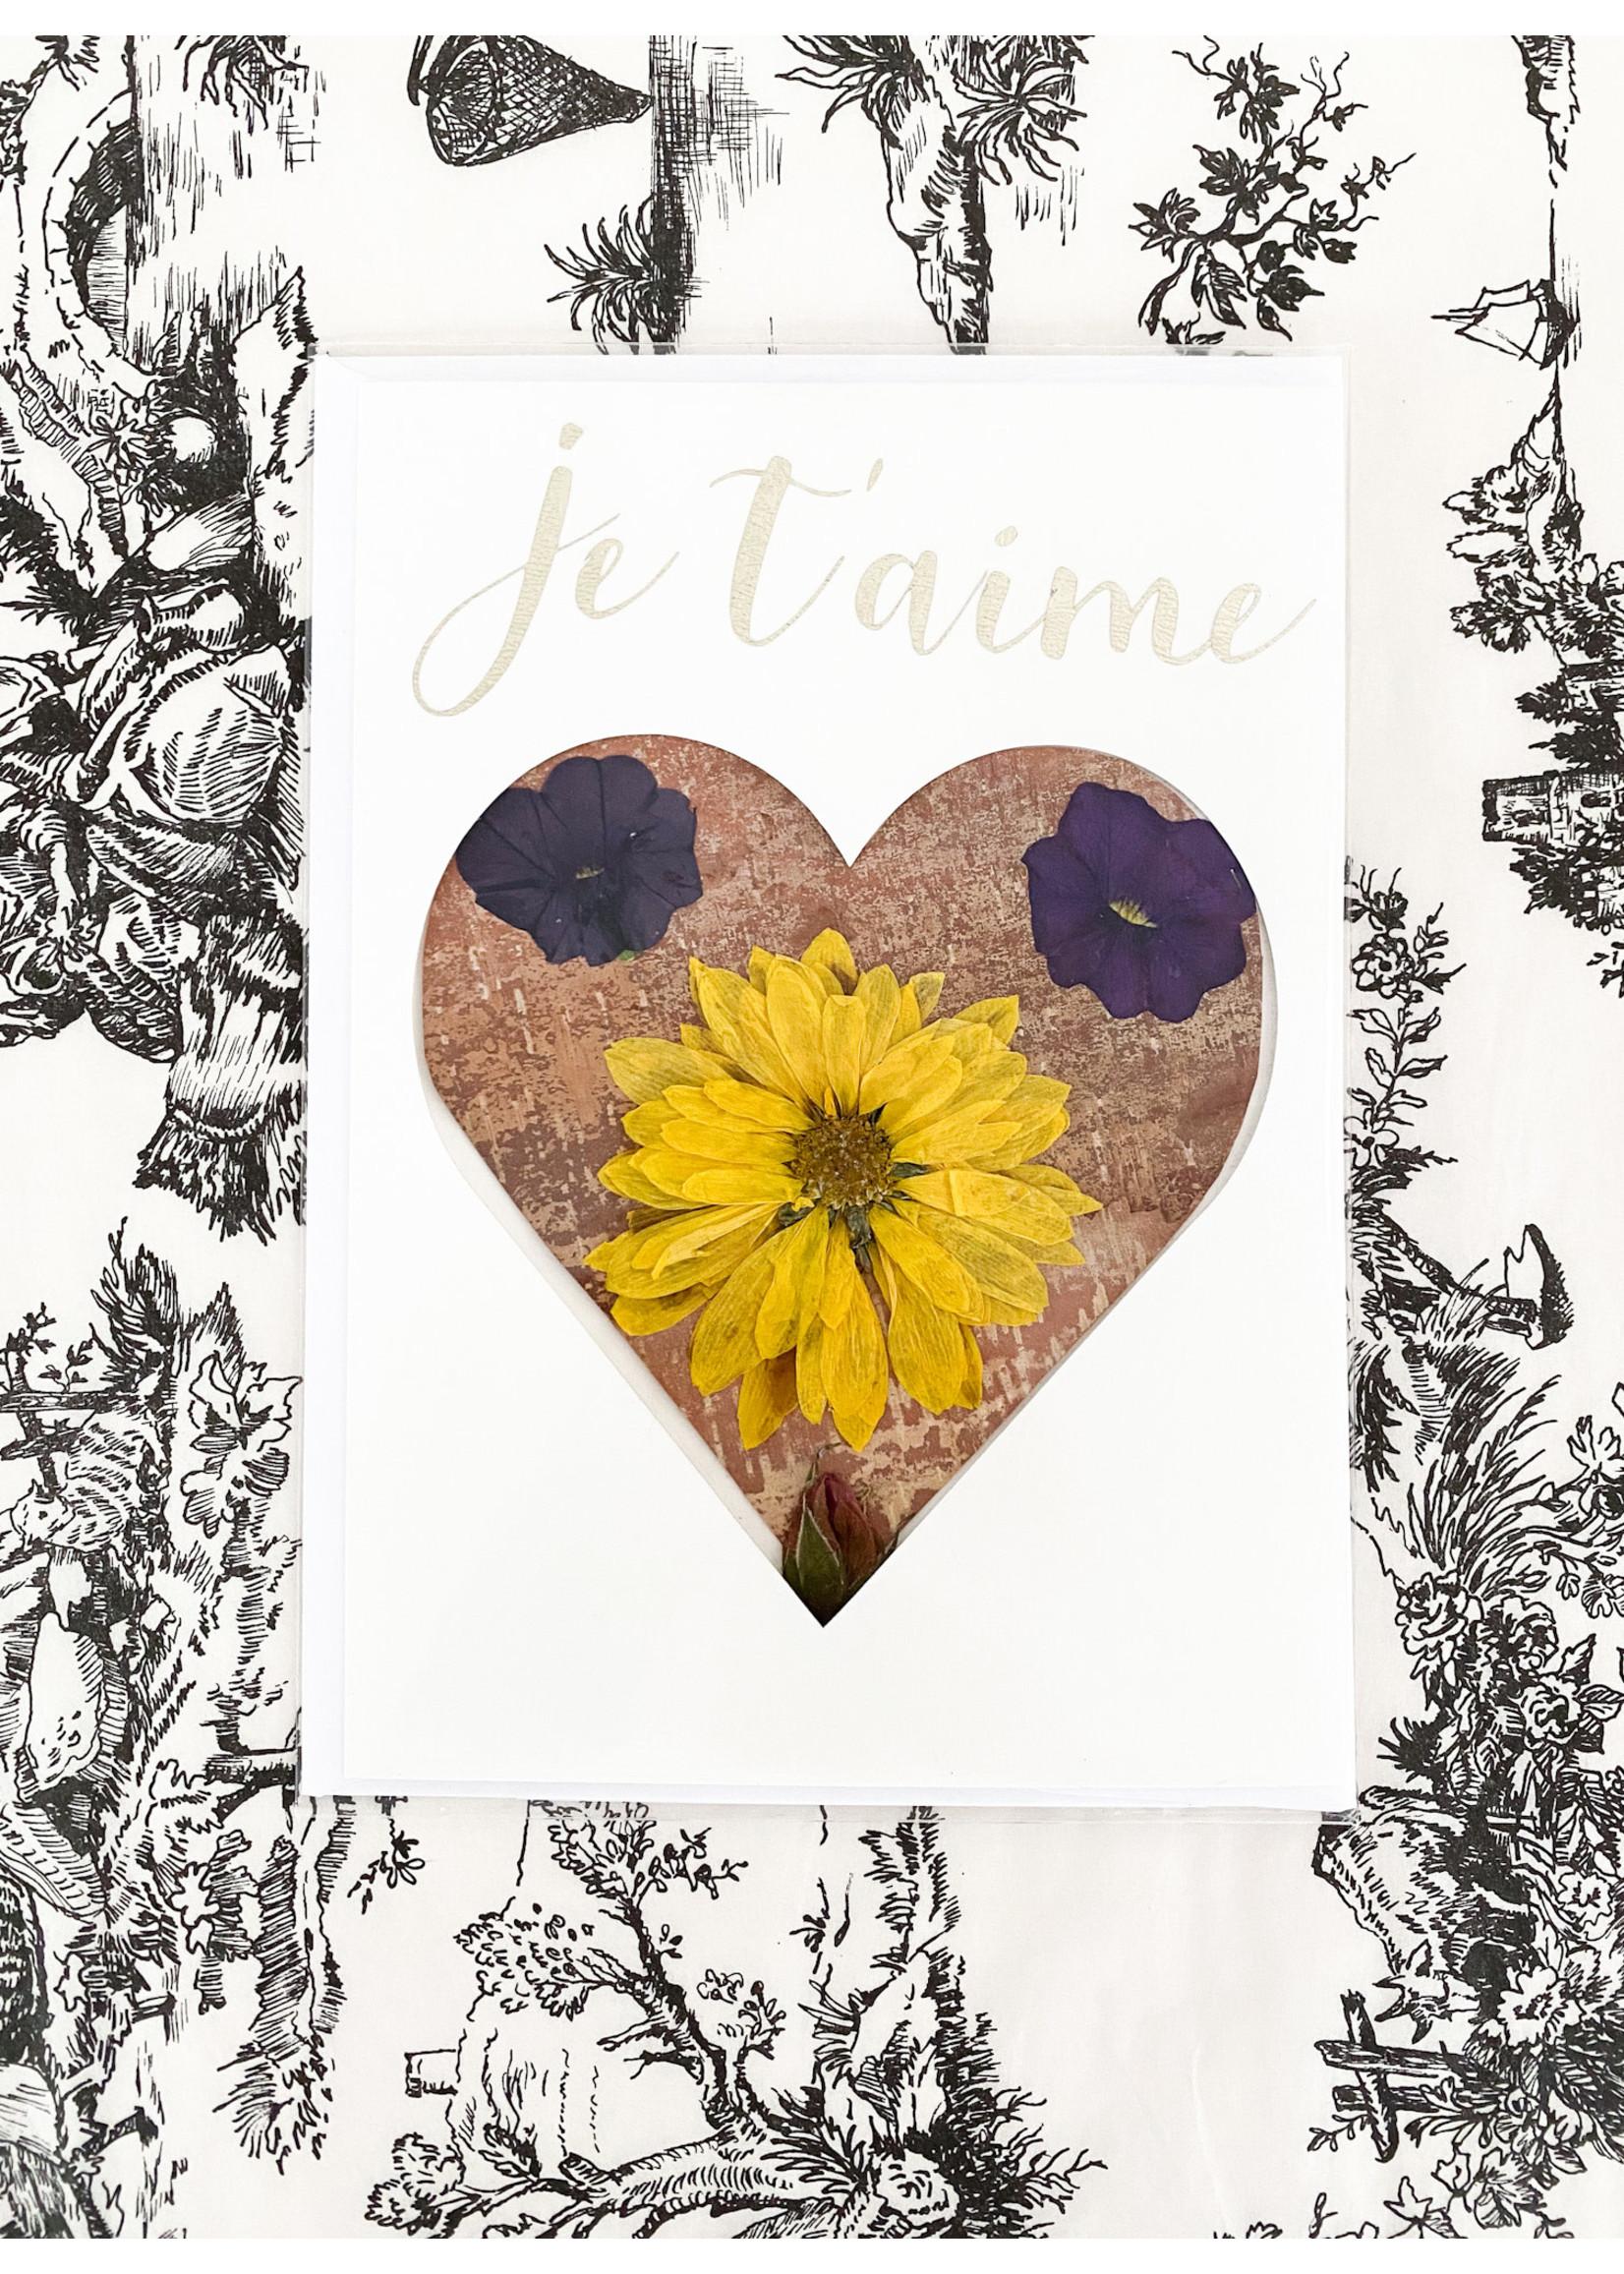 Locally Handmade & Pressed Flower & Birch Cards